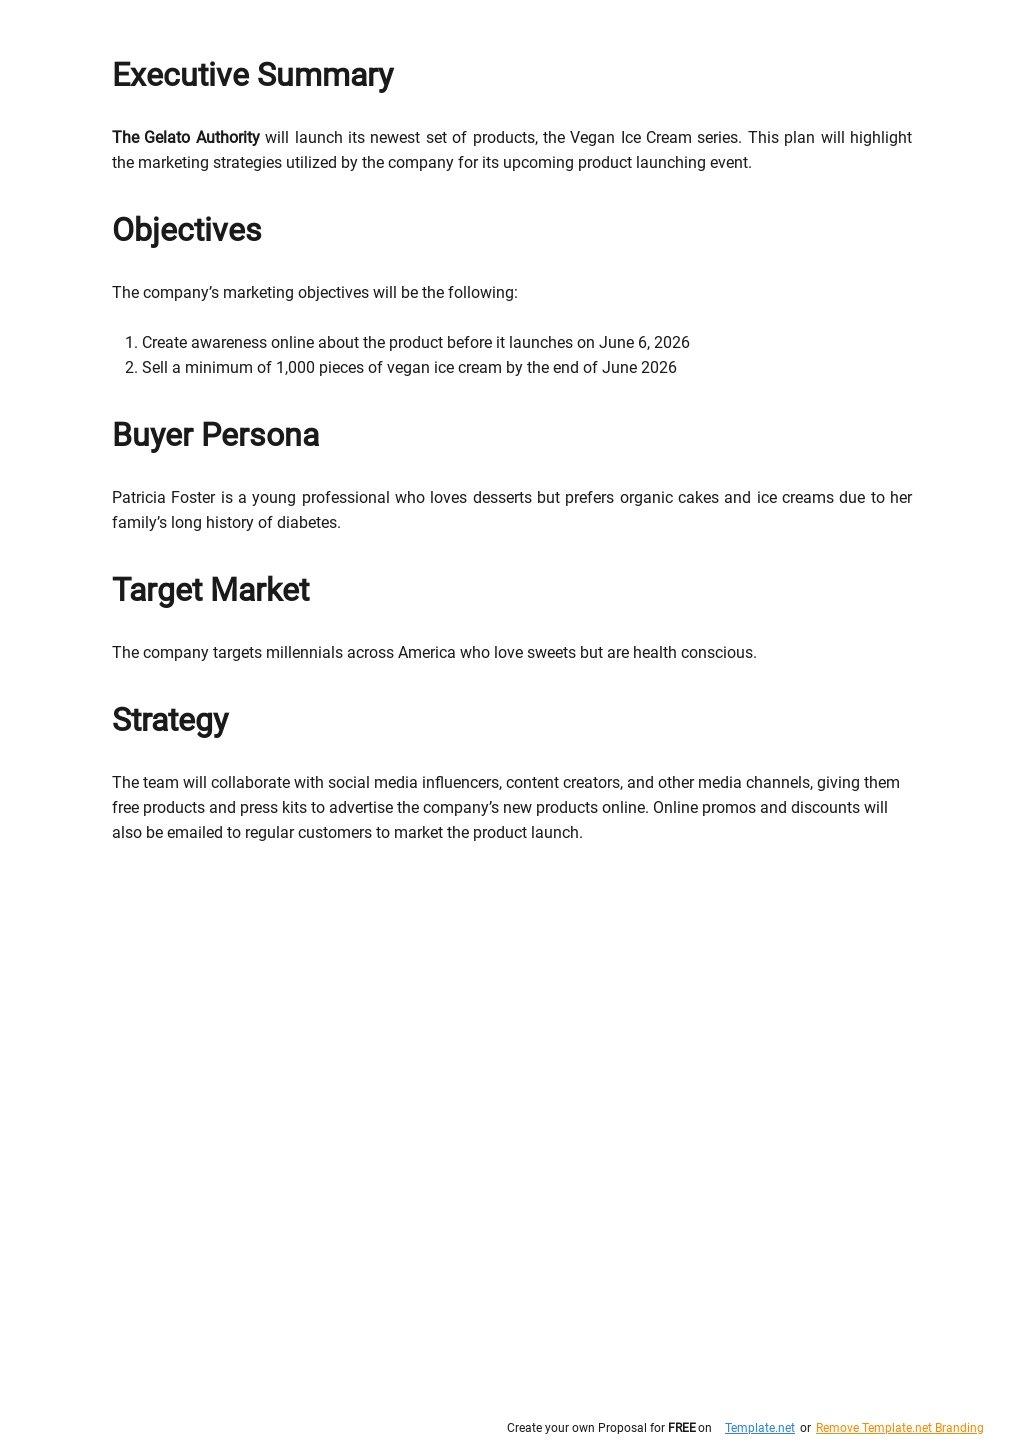 Marketing Product Launch Plan Template 1.jpe